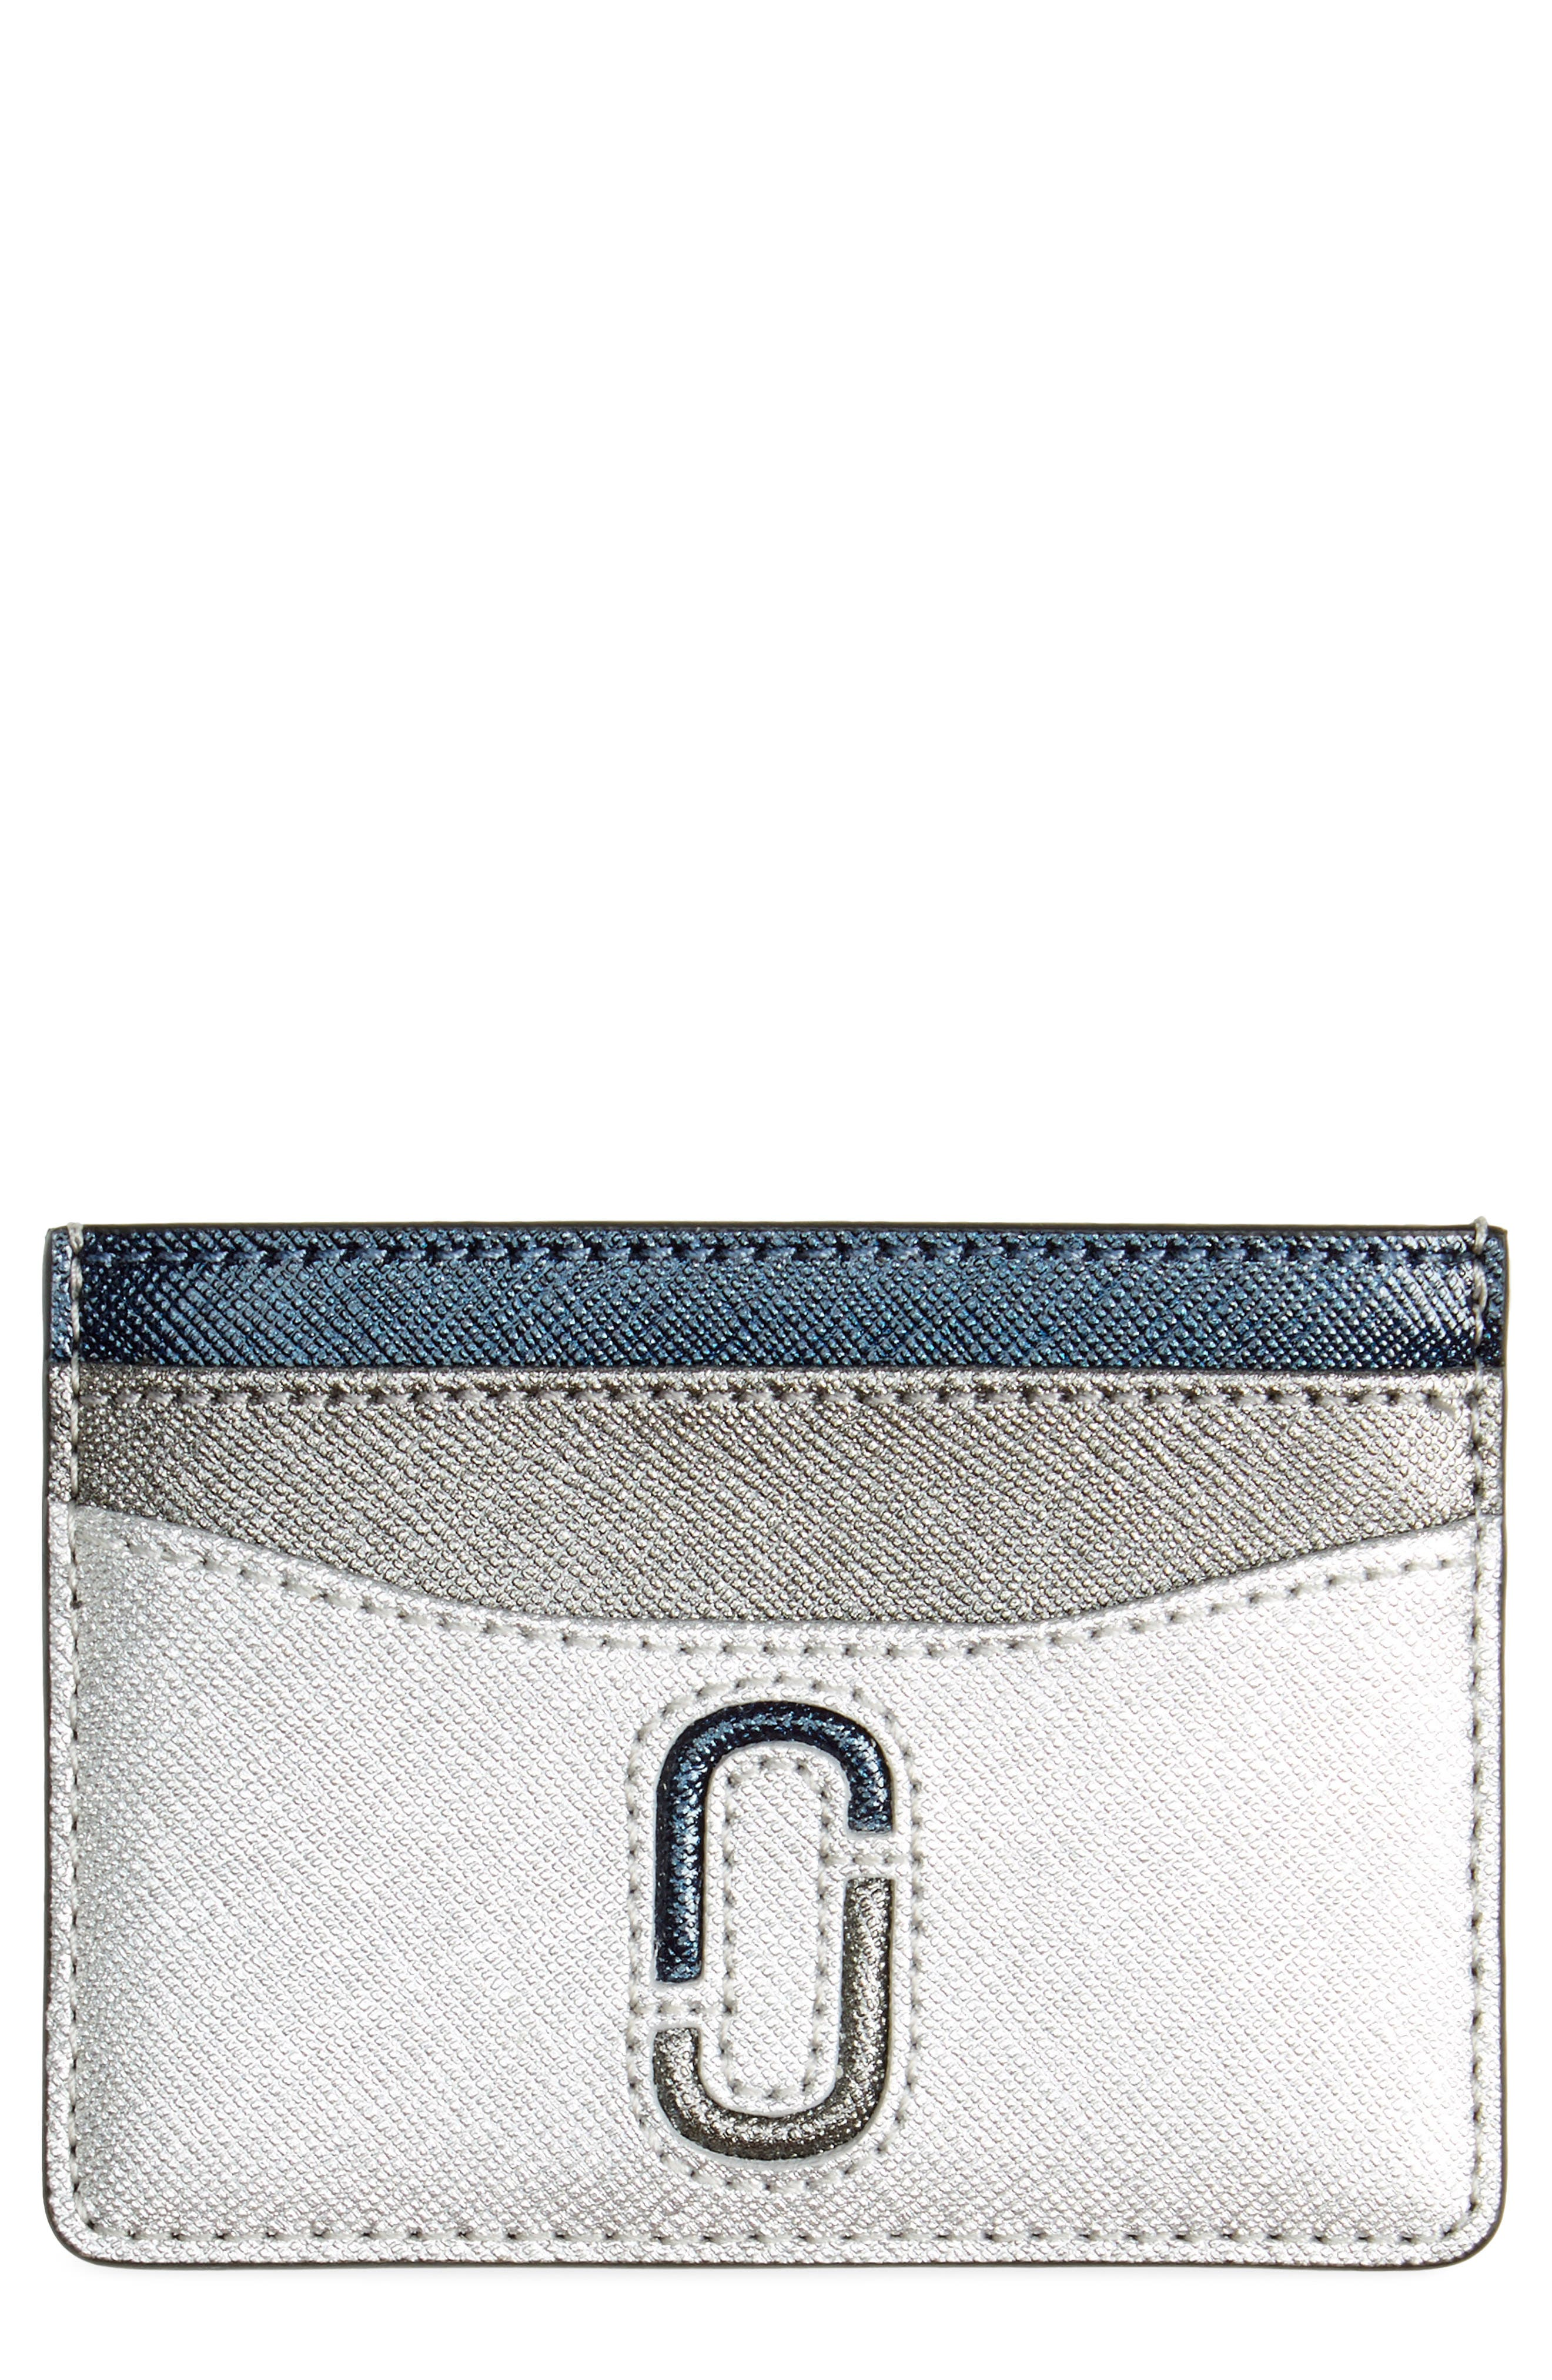 Snapshot Saffiano Leather Card Case,                         Main,                         color, 040